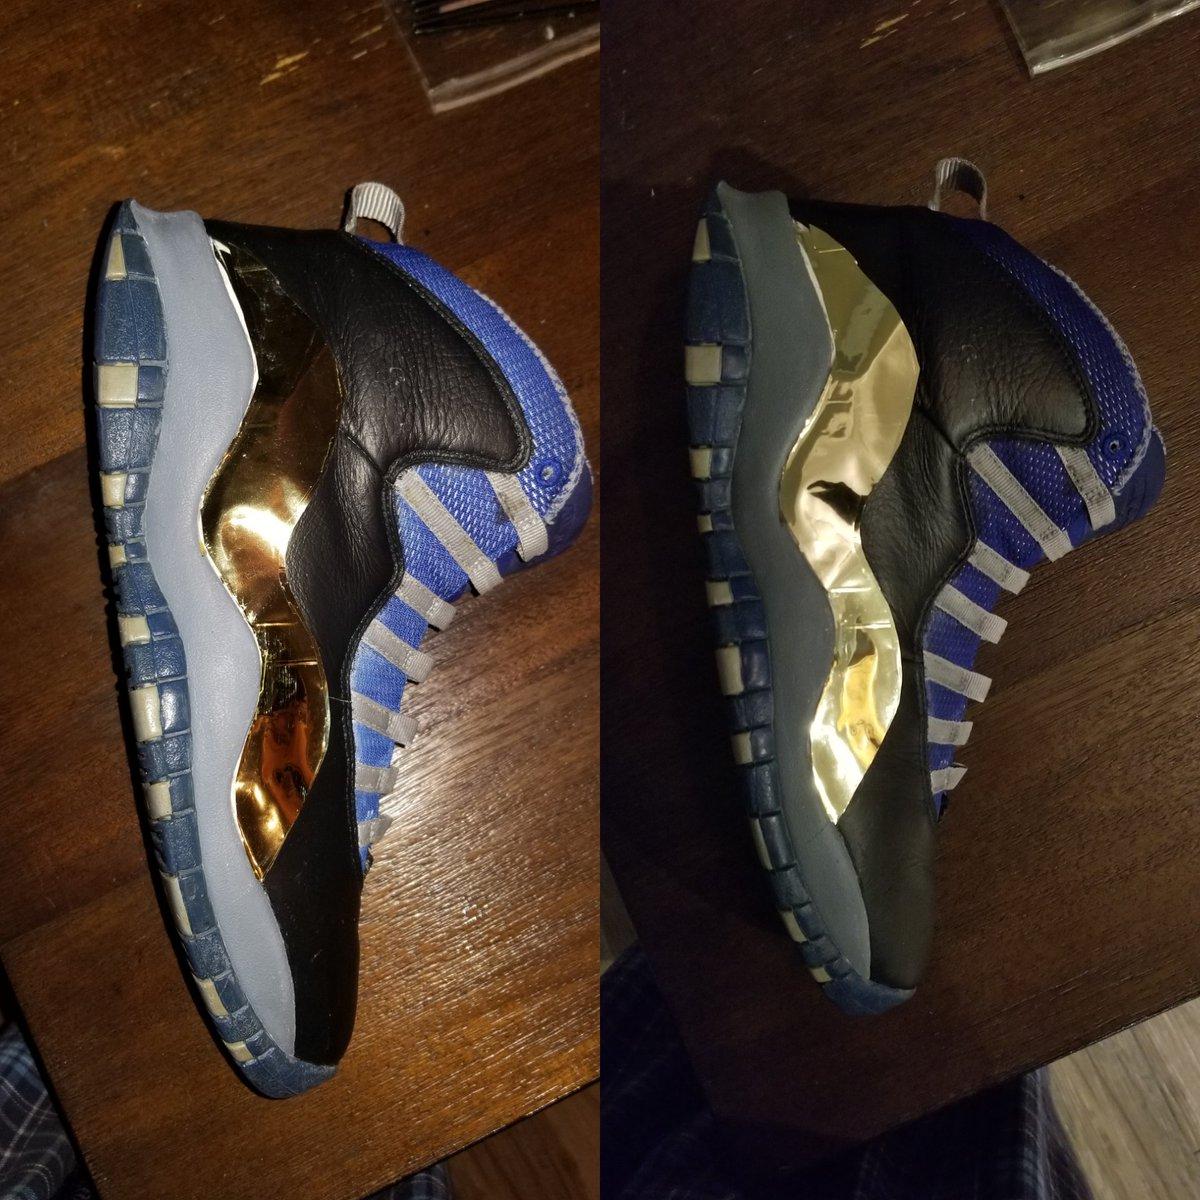 f99004b59939 ...  sneakerheads  kicksdaily  gold  thejourney  jordans  jordancustom  nike   jordan13  jordanx  restoration  tlc  beaterspic.twitter.com X67dvbRcaZ